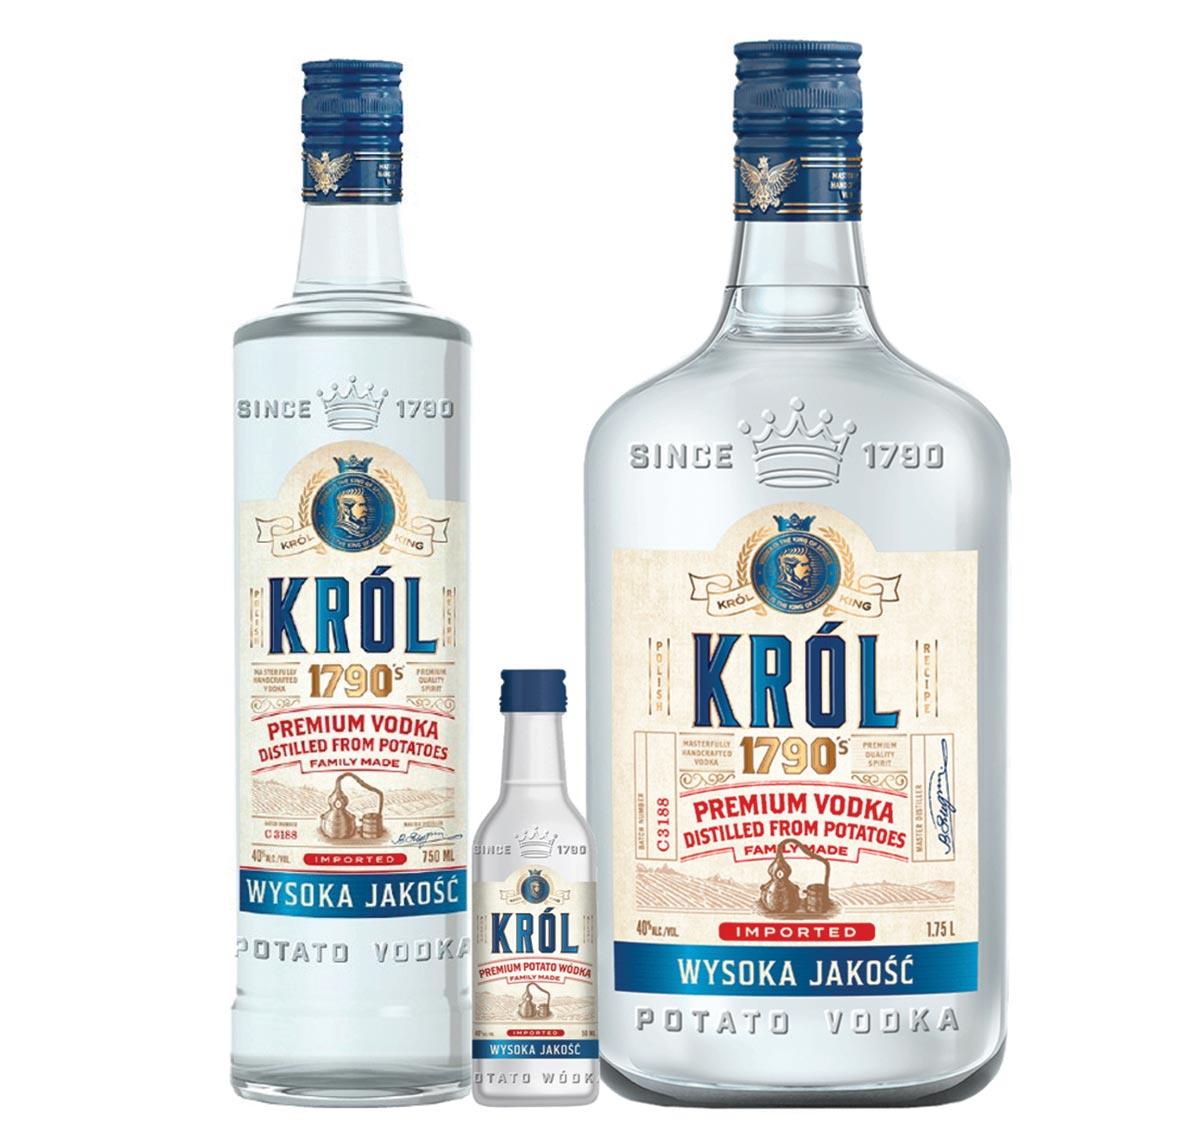 Polish Import Krol Premium Vodka Joins Opici's State Portfolio